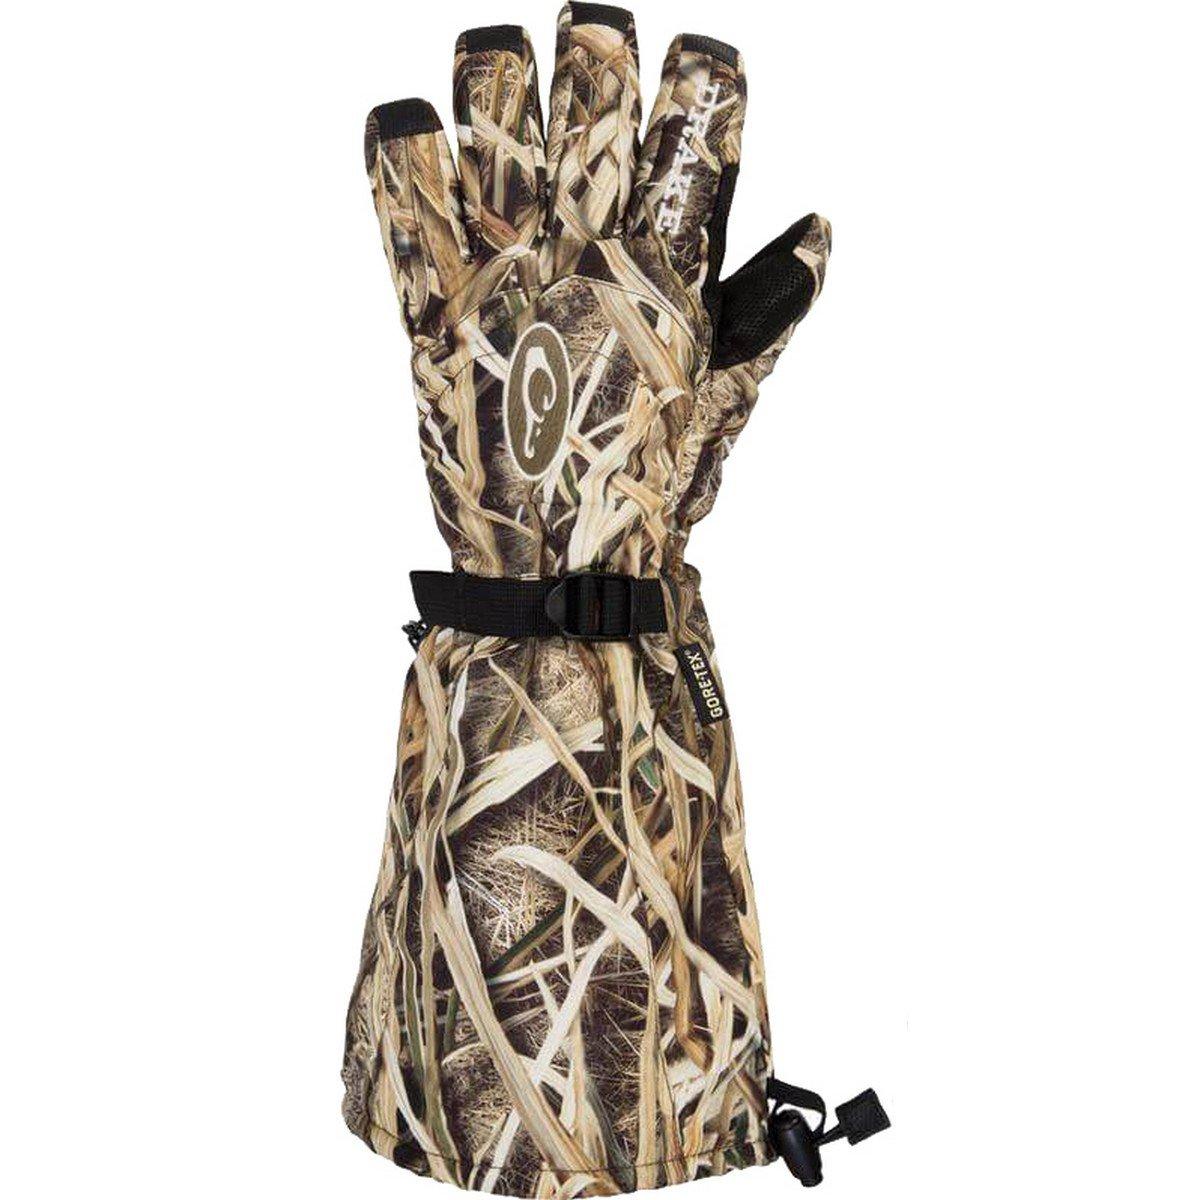 Drake Double Duty Decoy Glove Large Blades by Drake